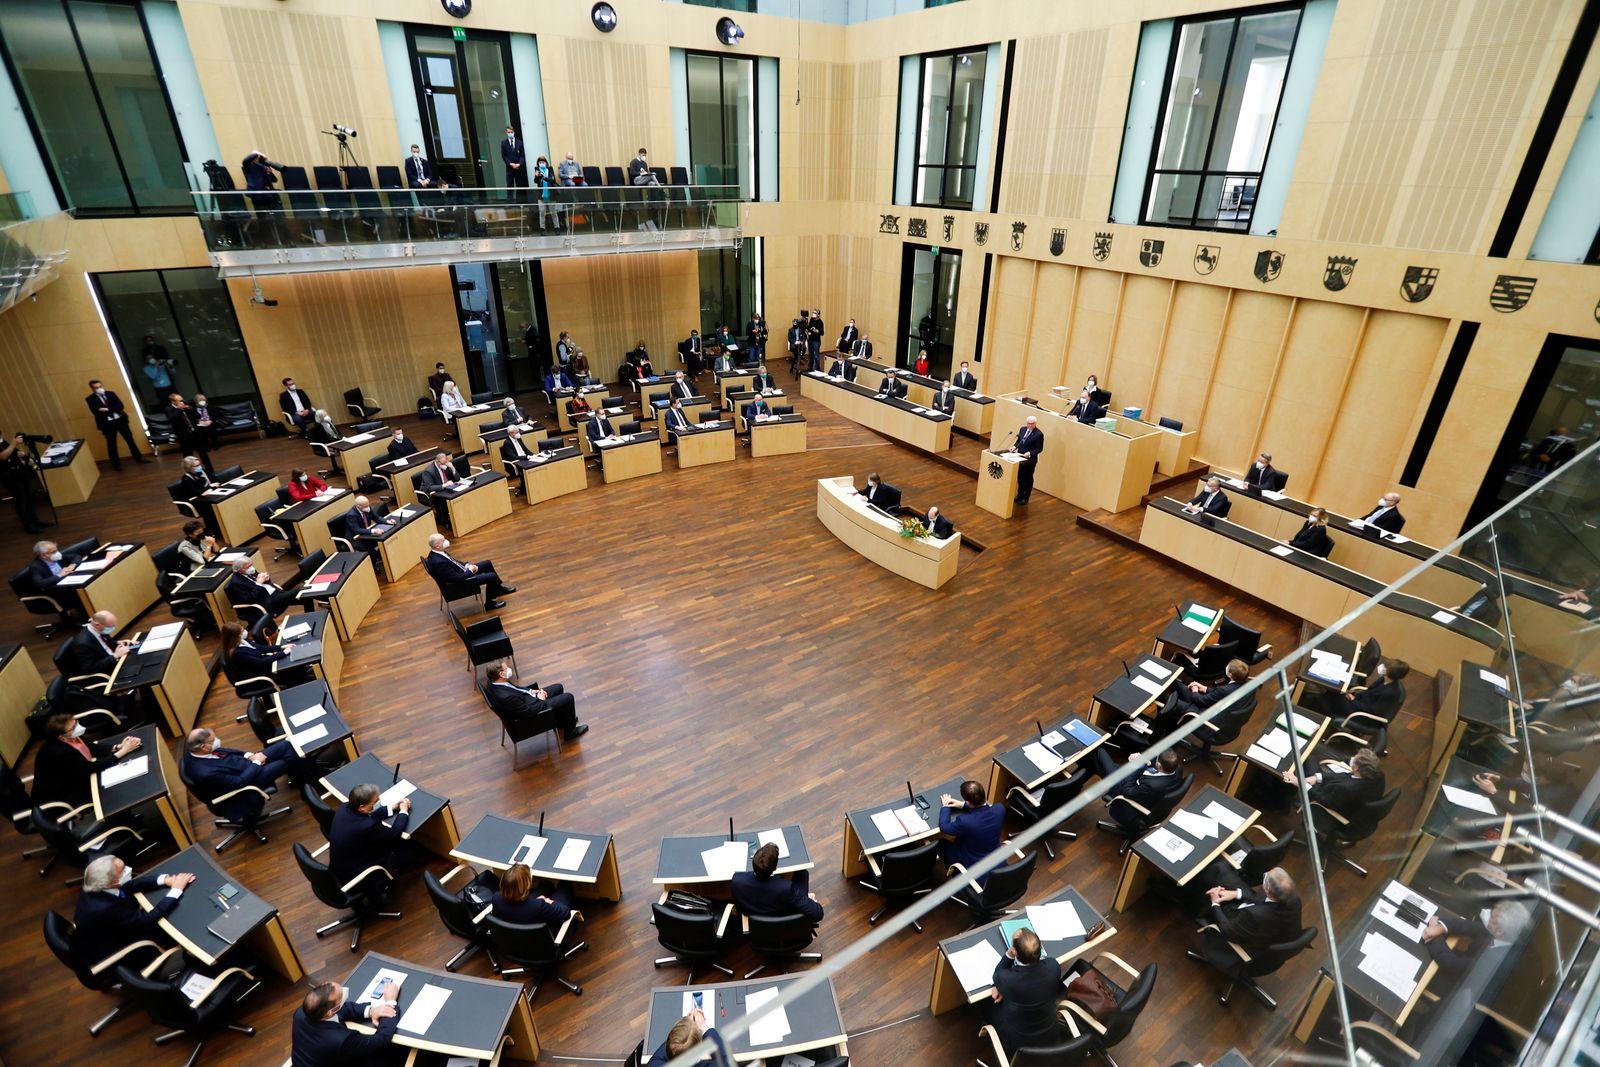 1000th Bundesrat session in Berlin